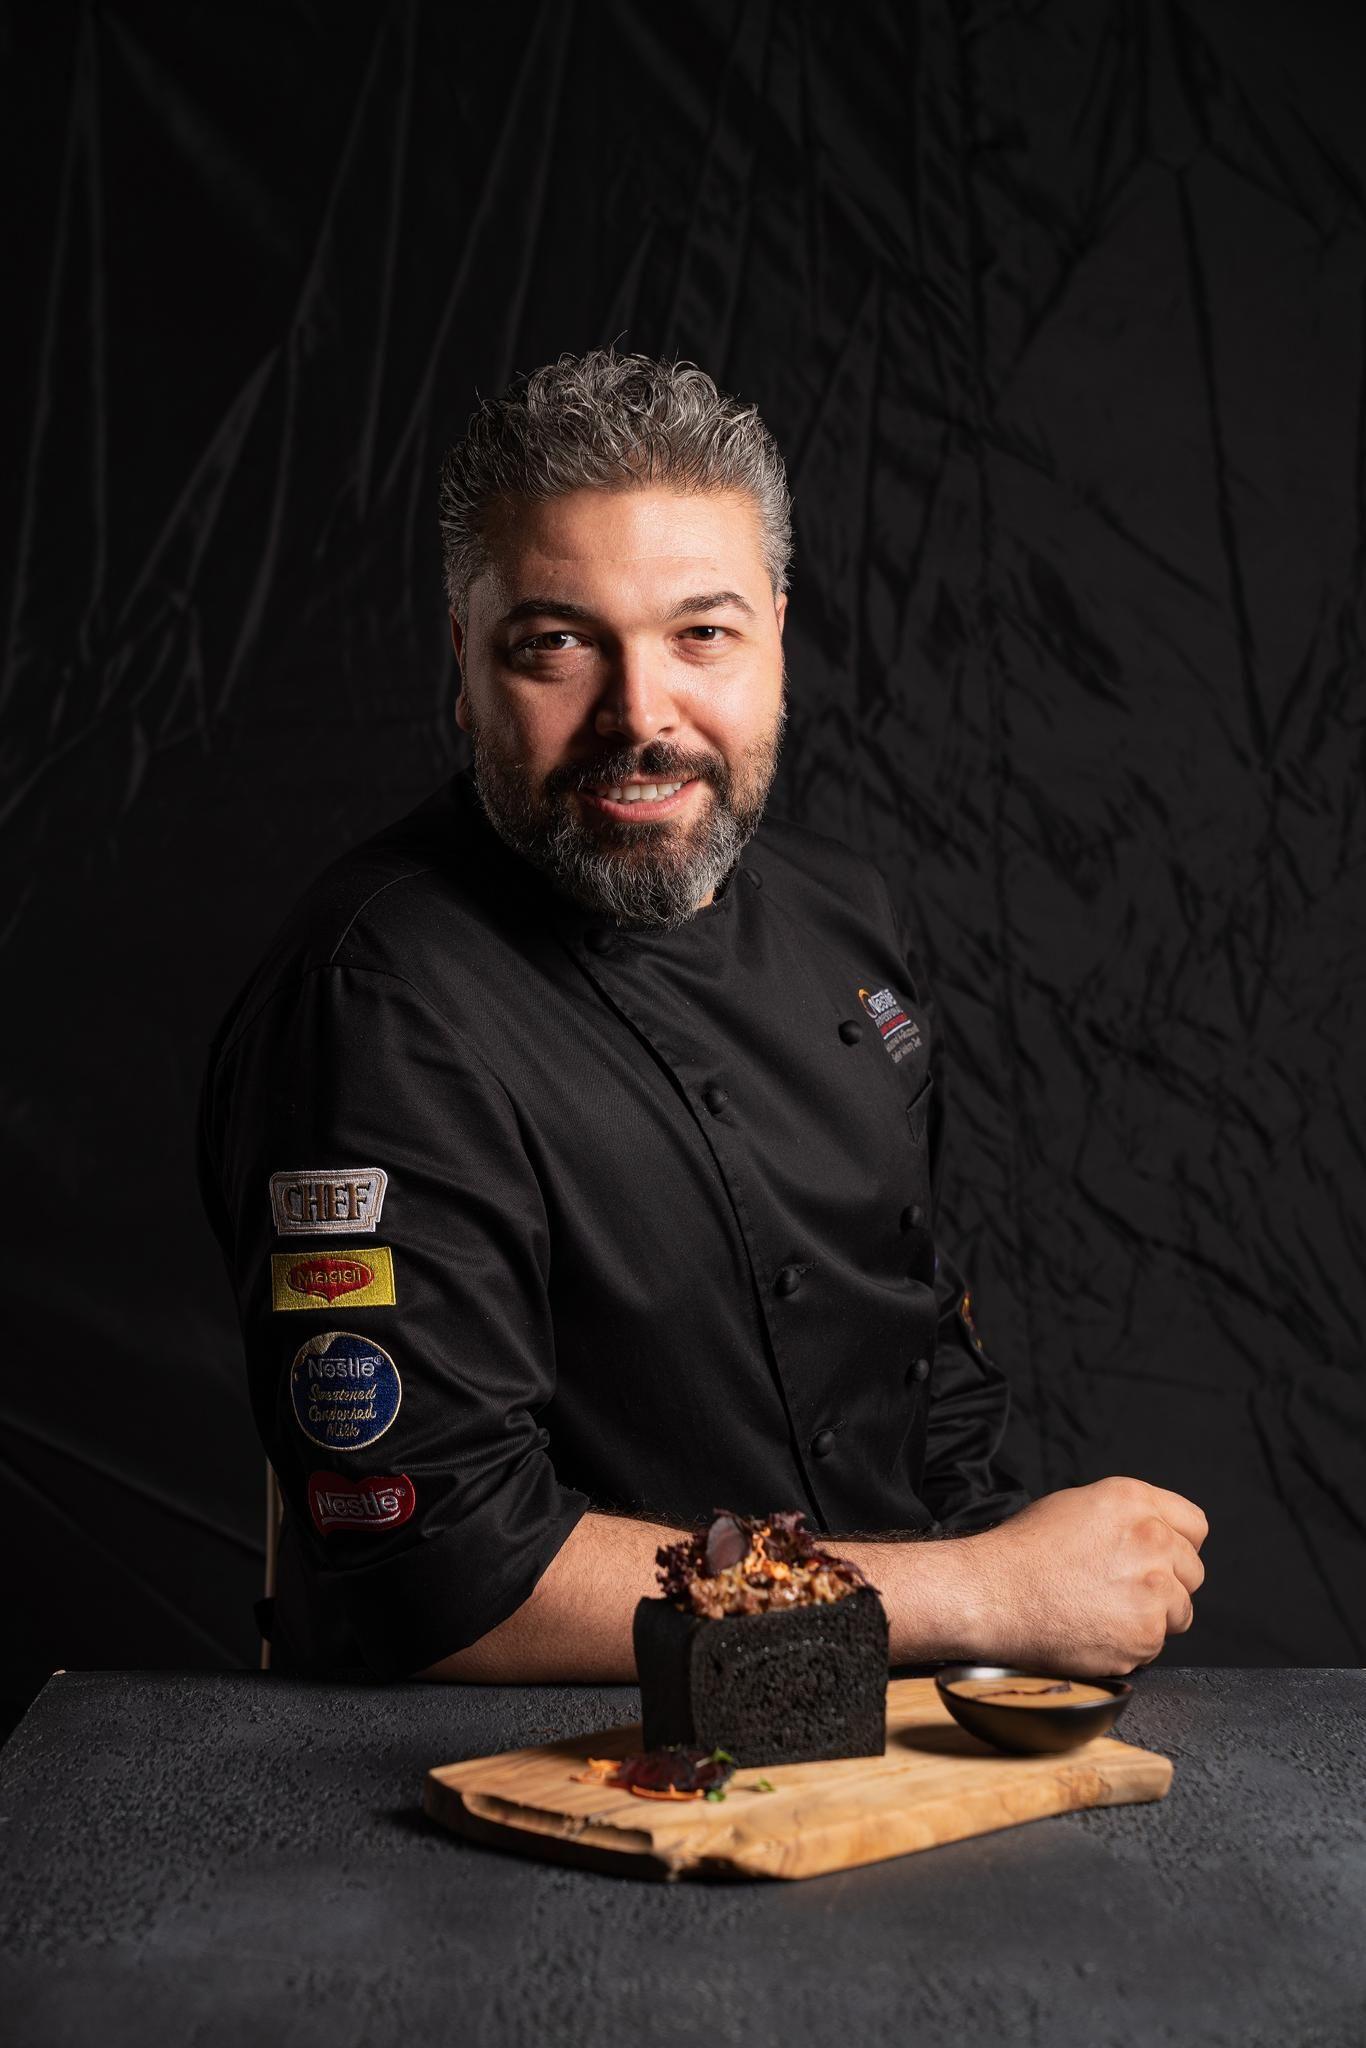 Chef Mohammed Al Ghazzaoui